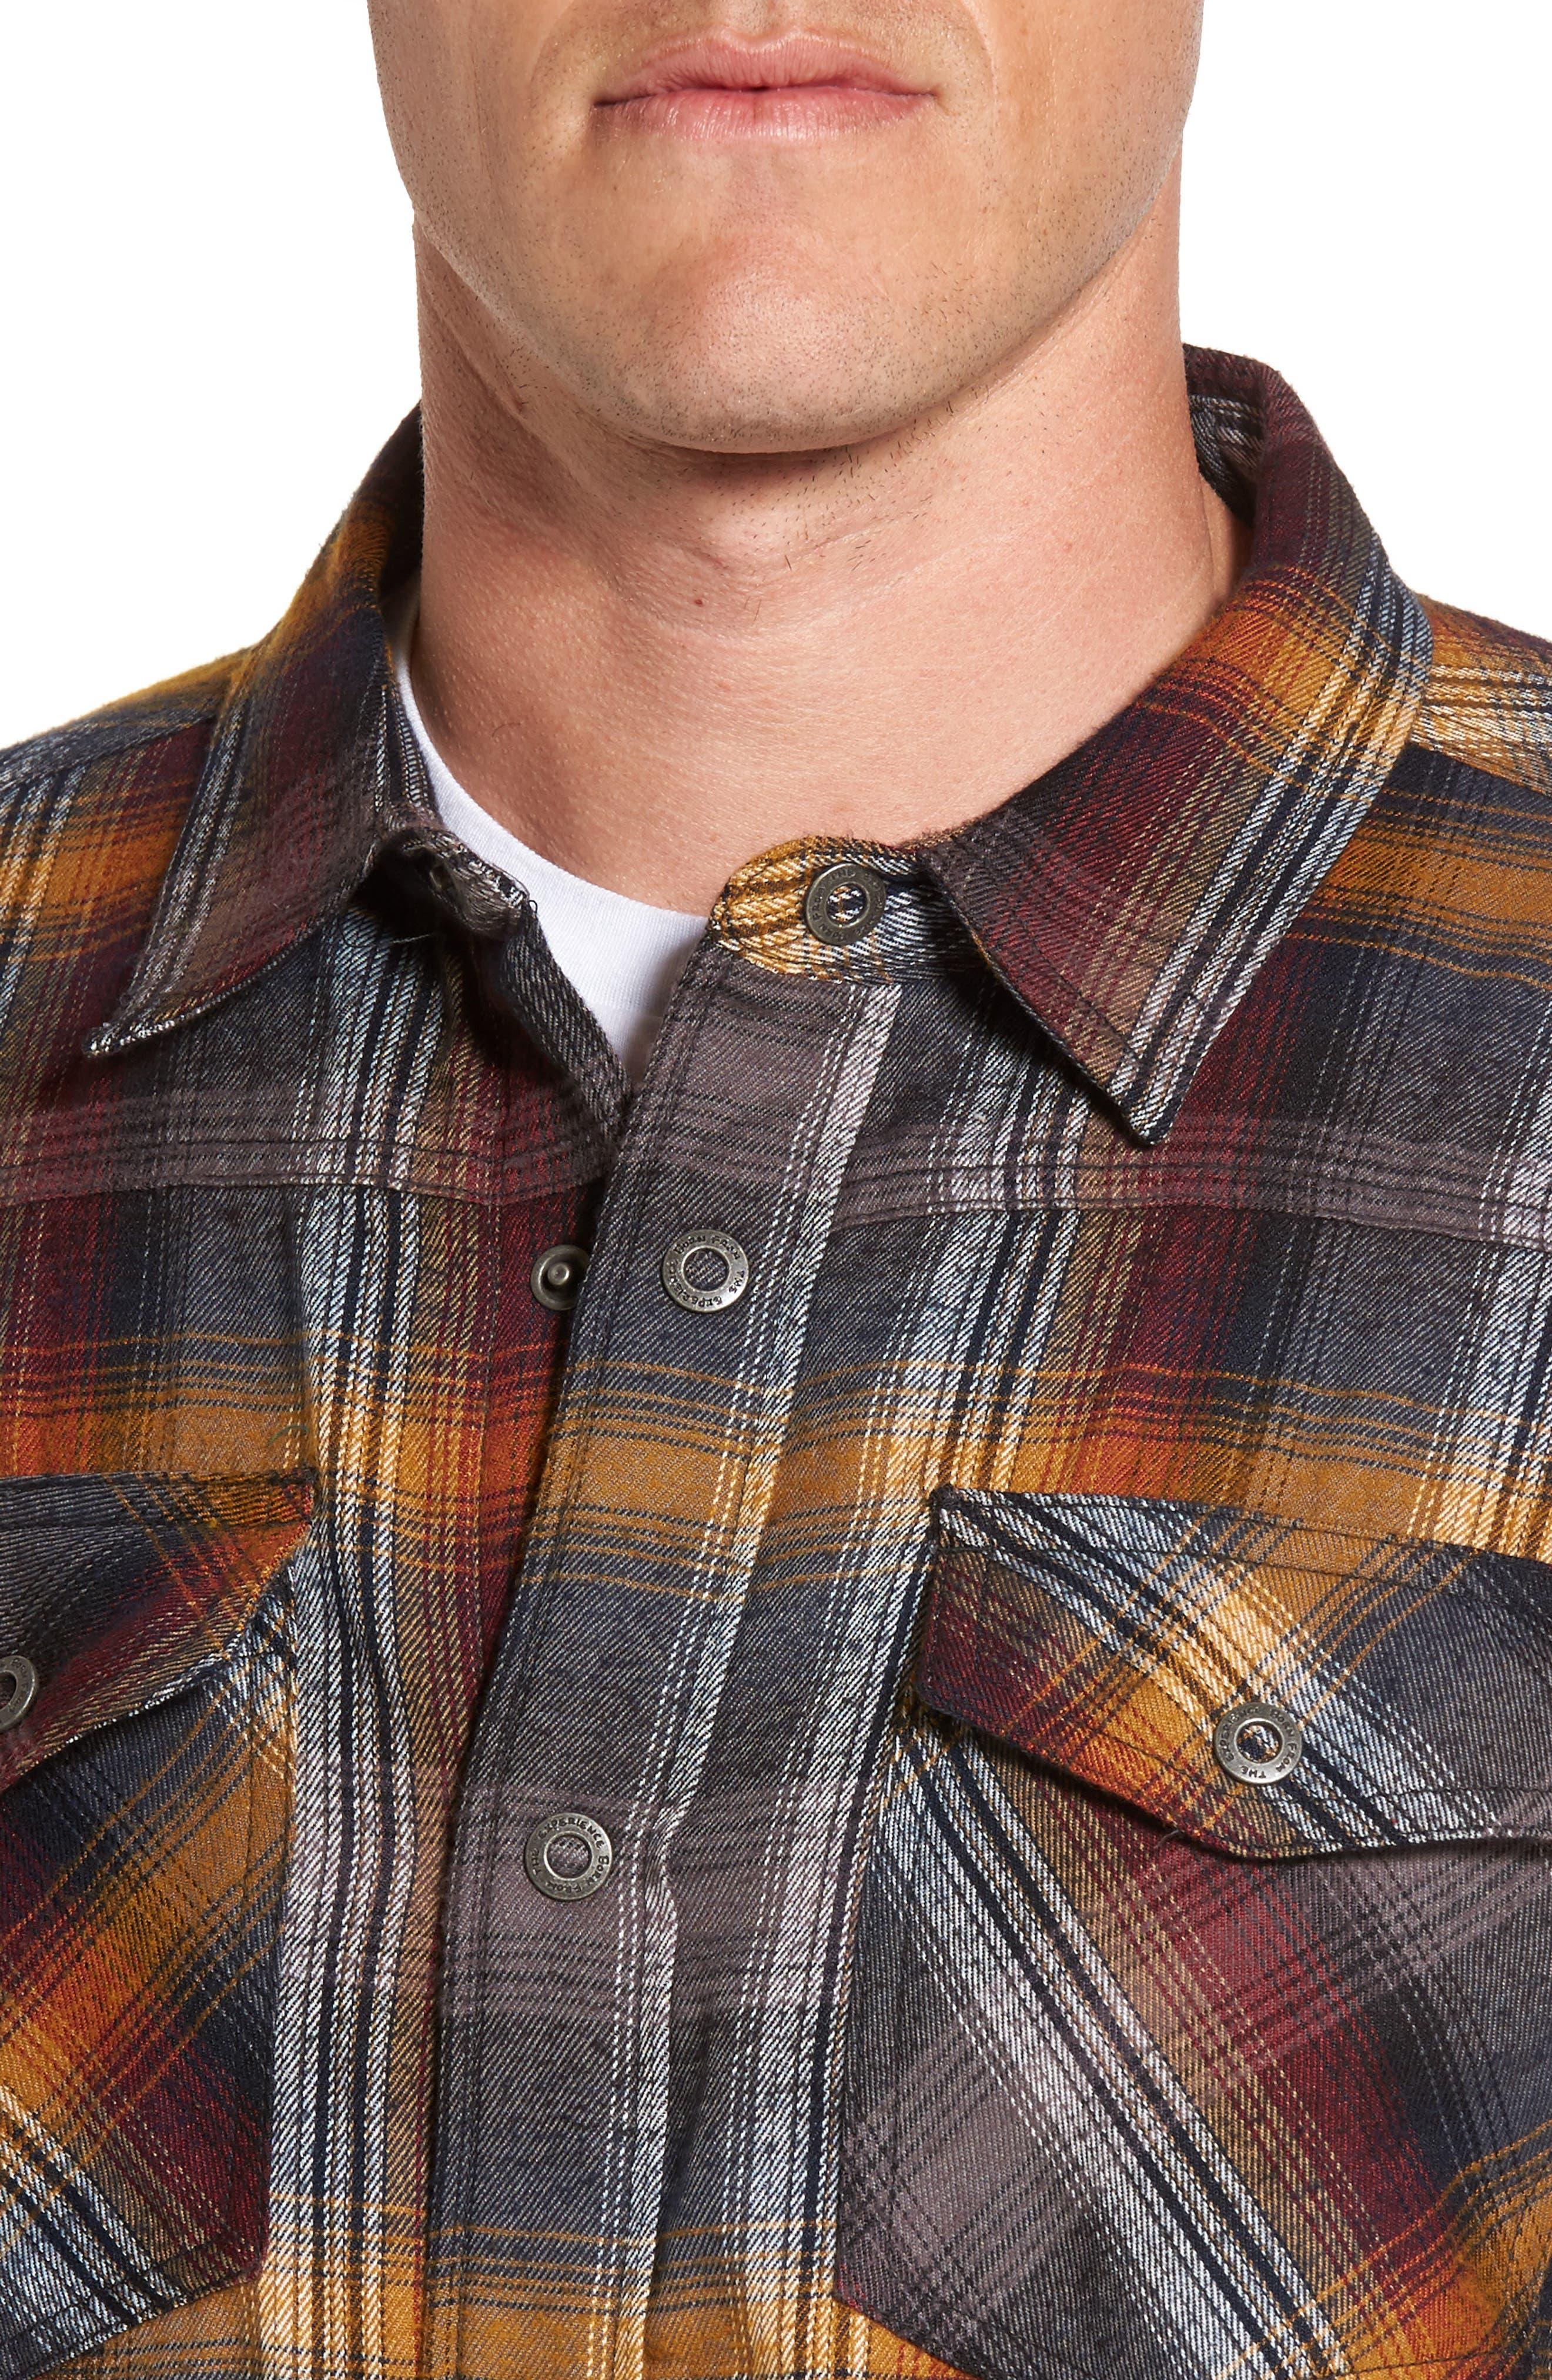 Asylum Regular Fit Plaid Shirt Jacket,                             Alternate thumbnail 4, color,                             Black